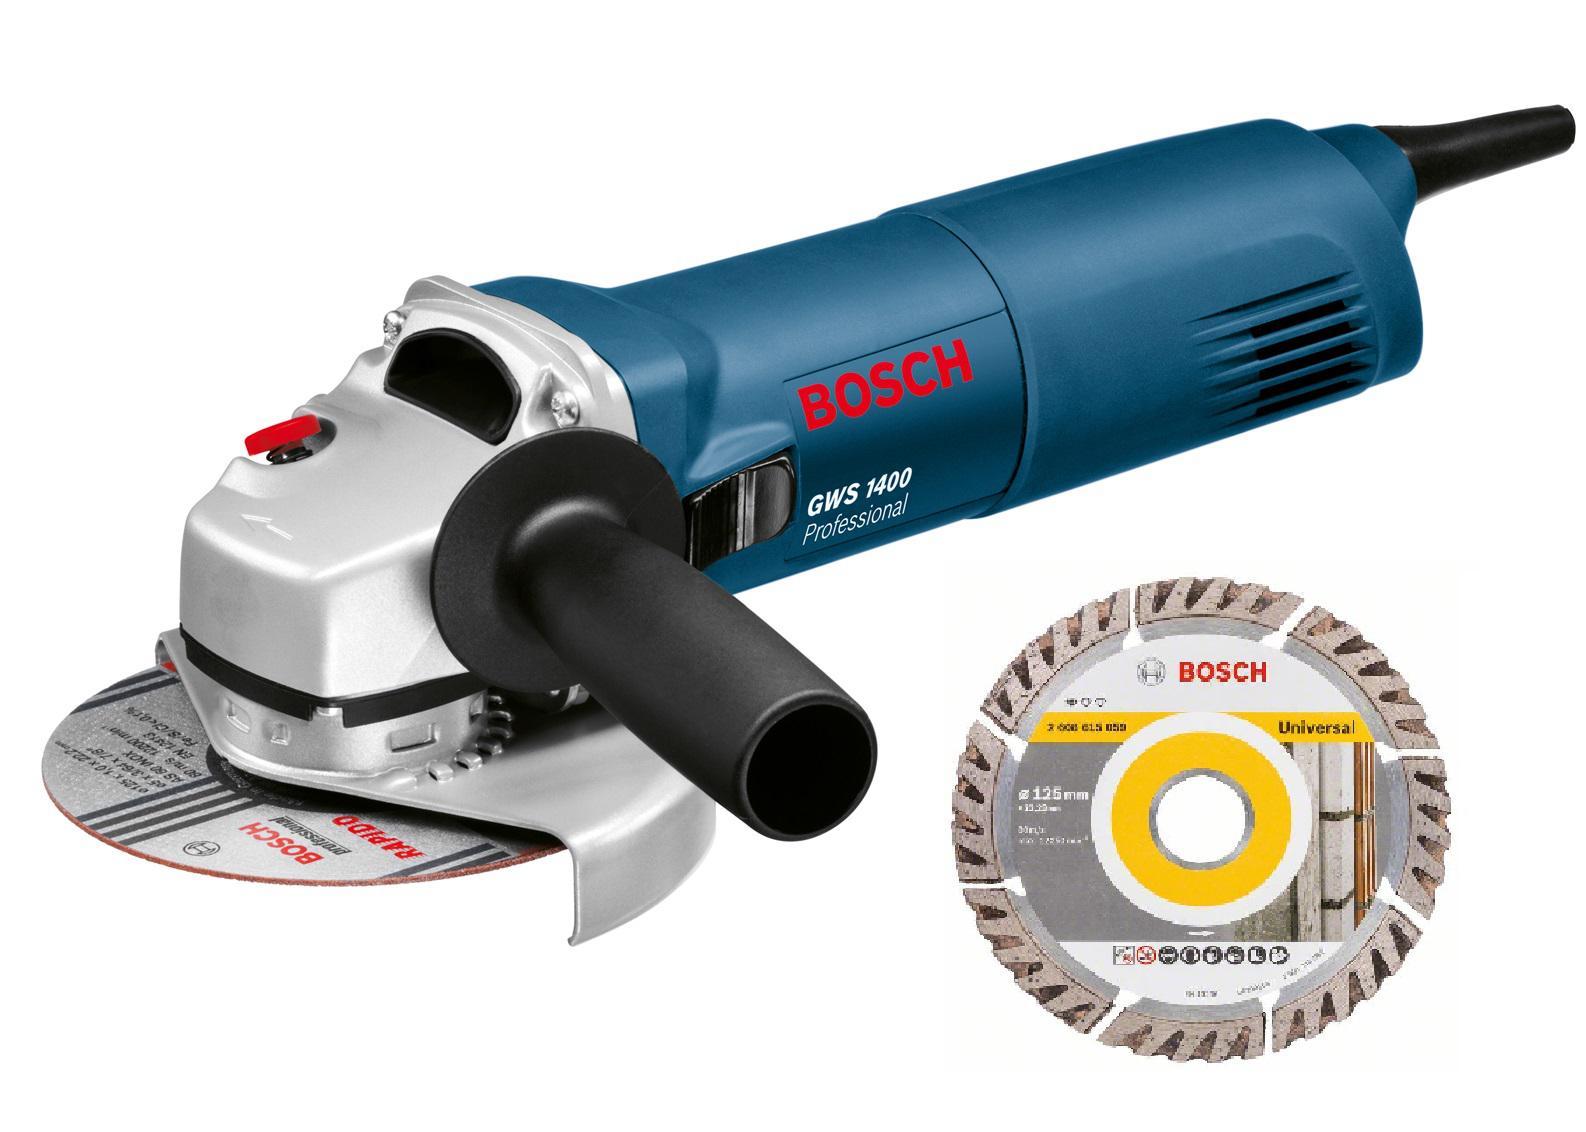 УШМ Bosch Gws 1400 + Диск алм.universal 125х22мм шлифовальная машина bosch gws 1400 professional